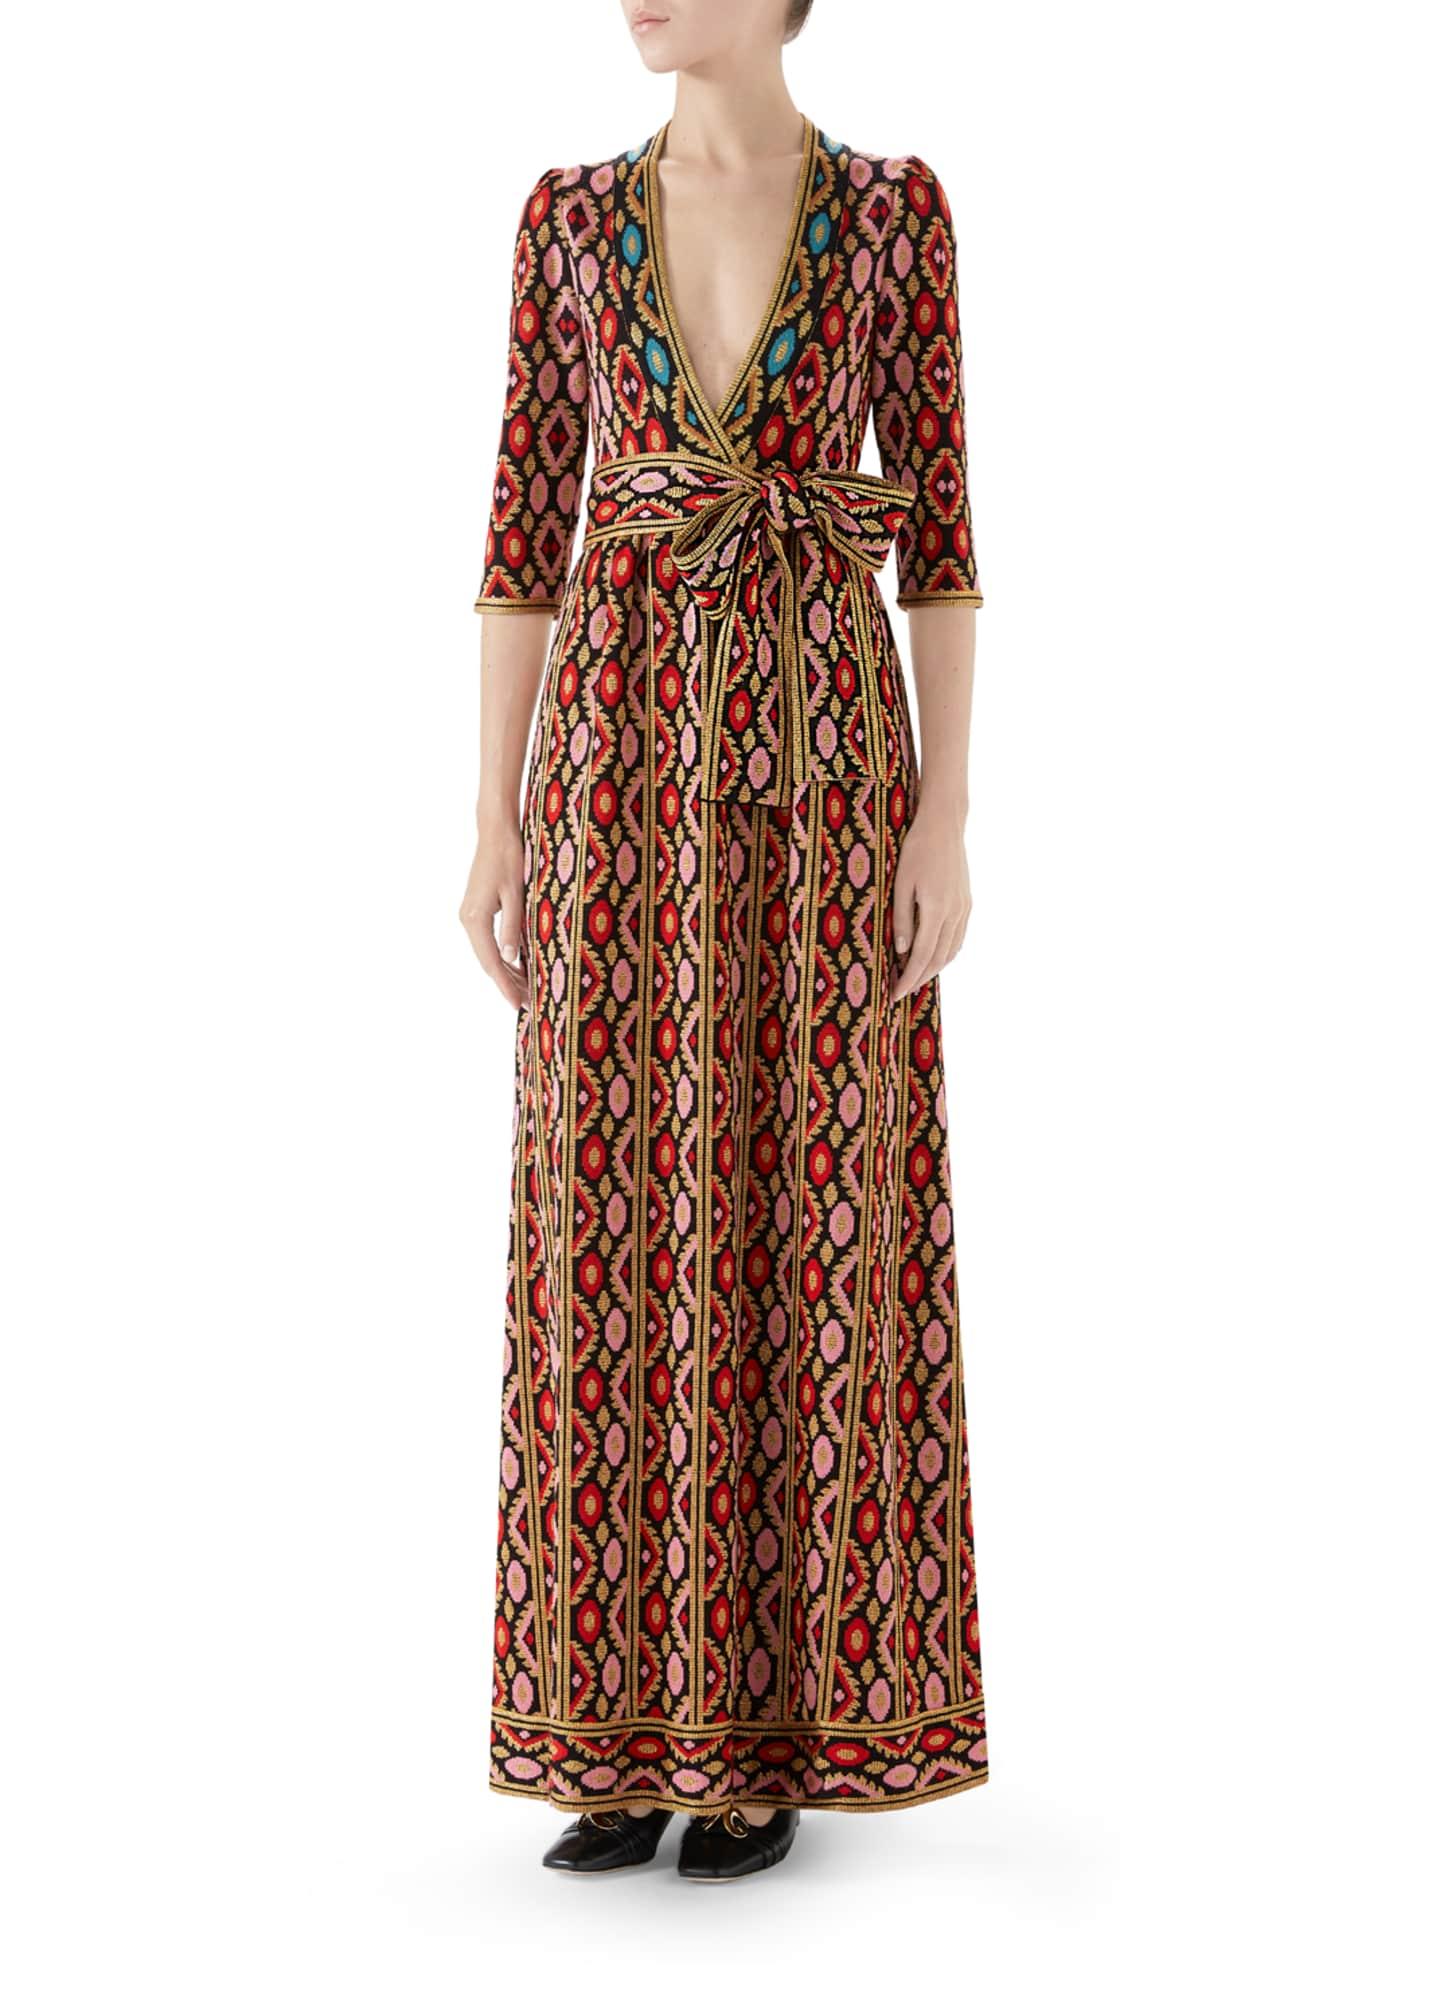 Gucci Jardin en Hiver Metallic Jacquard Maxi Dress